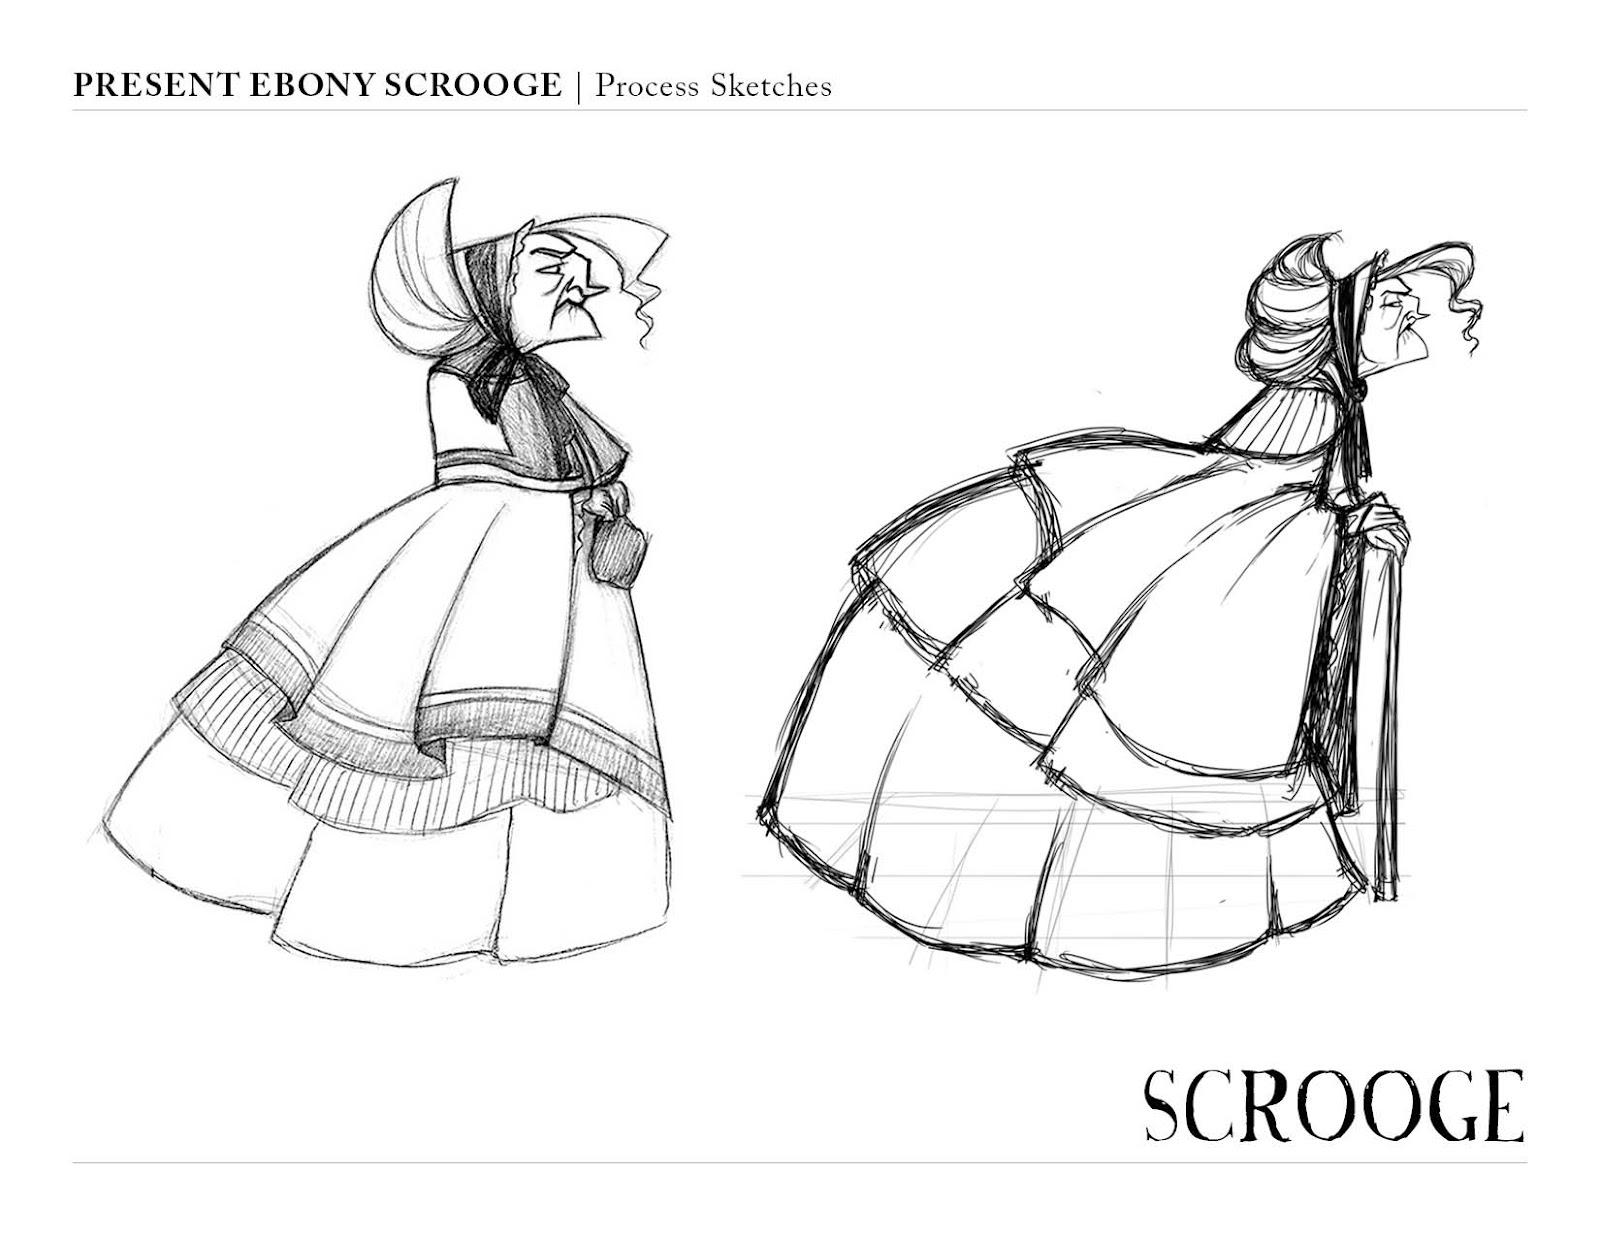 Fundamentals Of Character Design Class With David Colman : Elora s sketchcan scrooge final for david colman